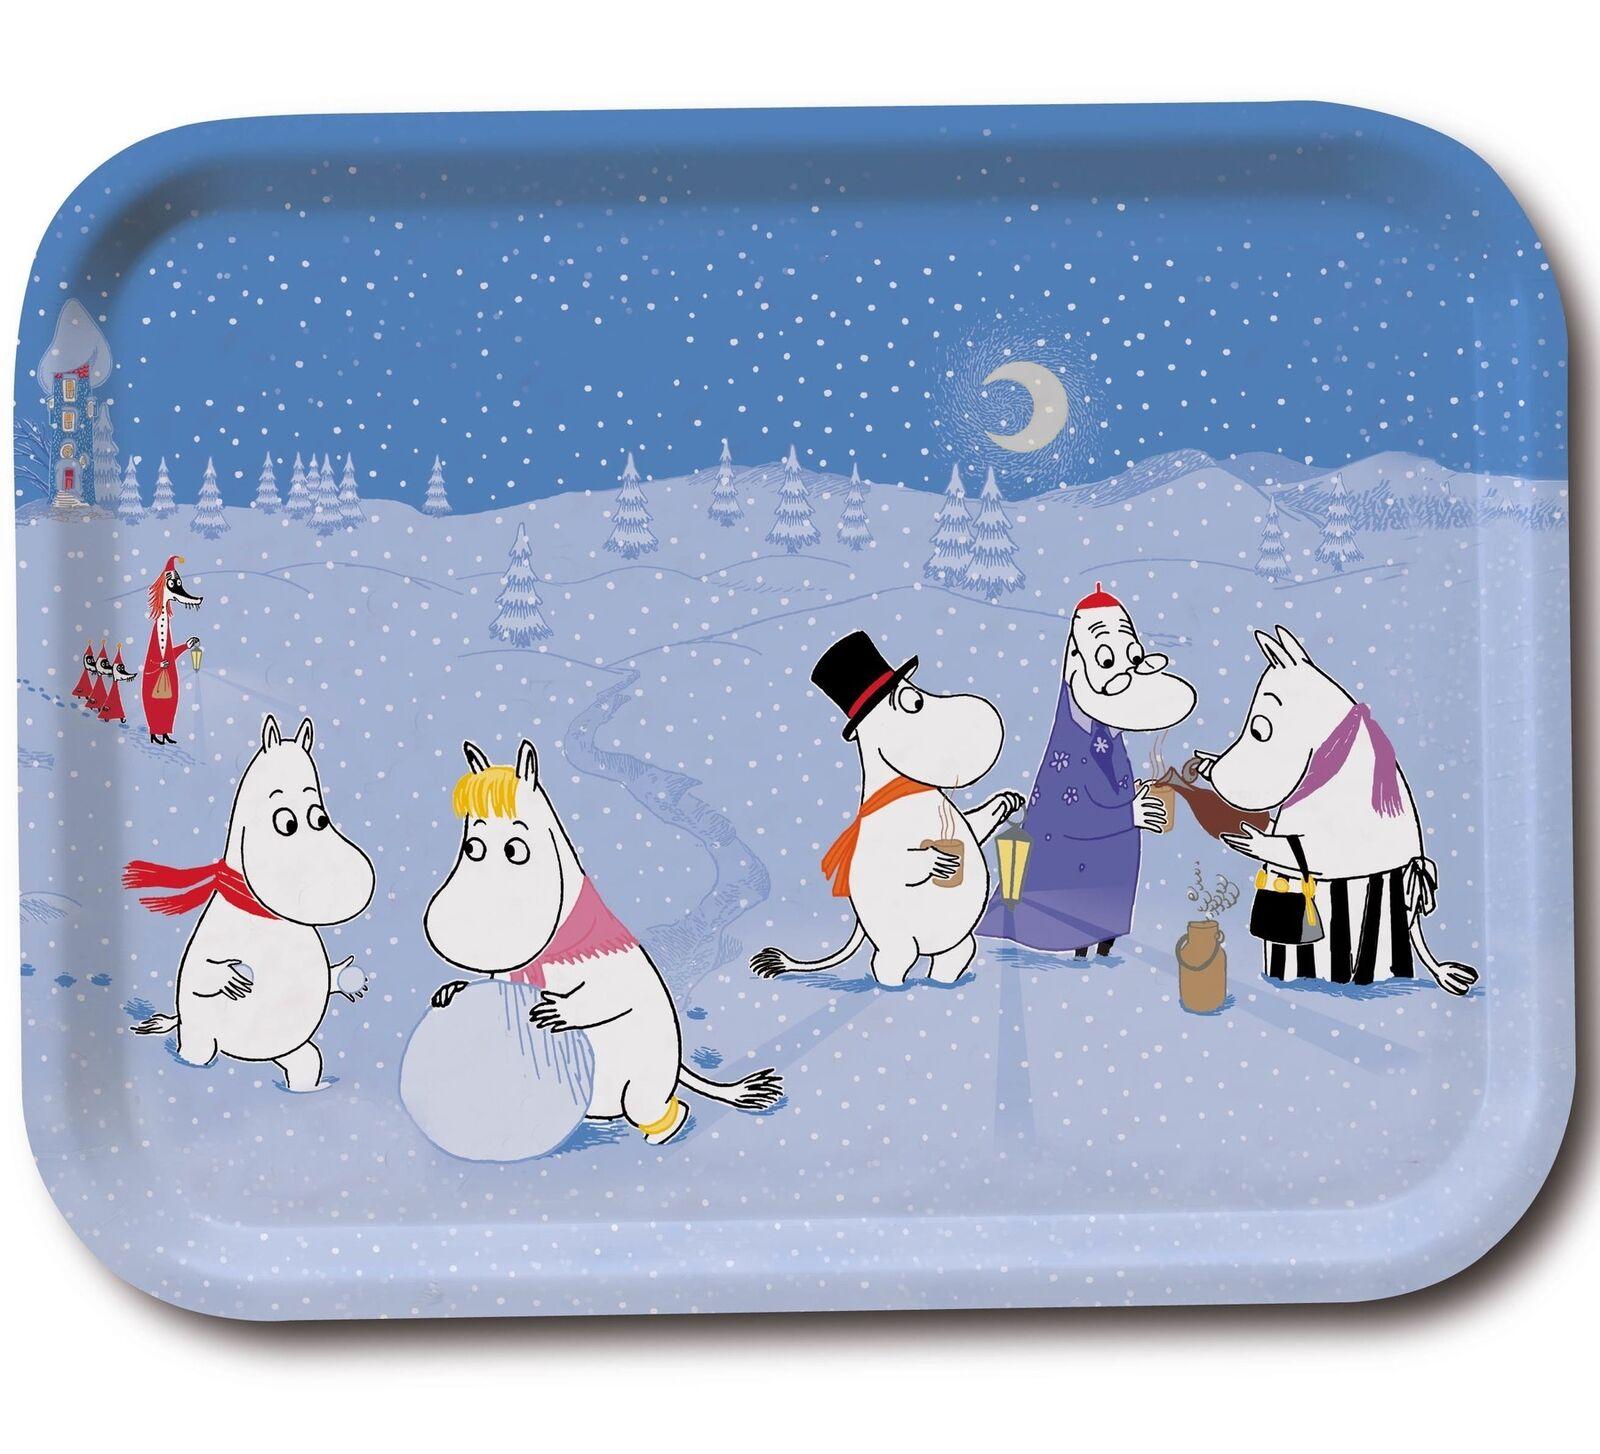 Moomin Tablett Winter Spiele 27 X 20 cm Optodesign